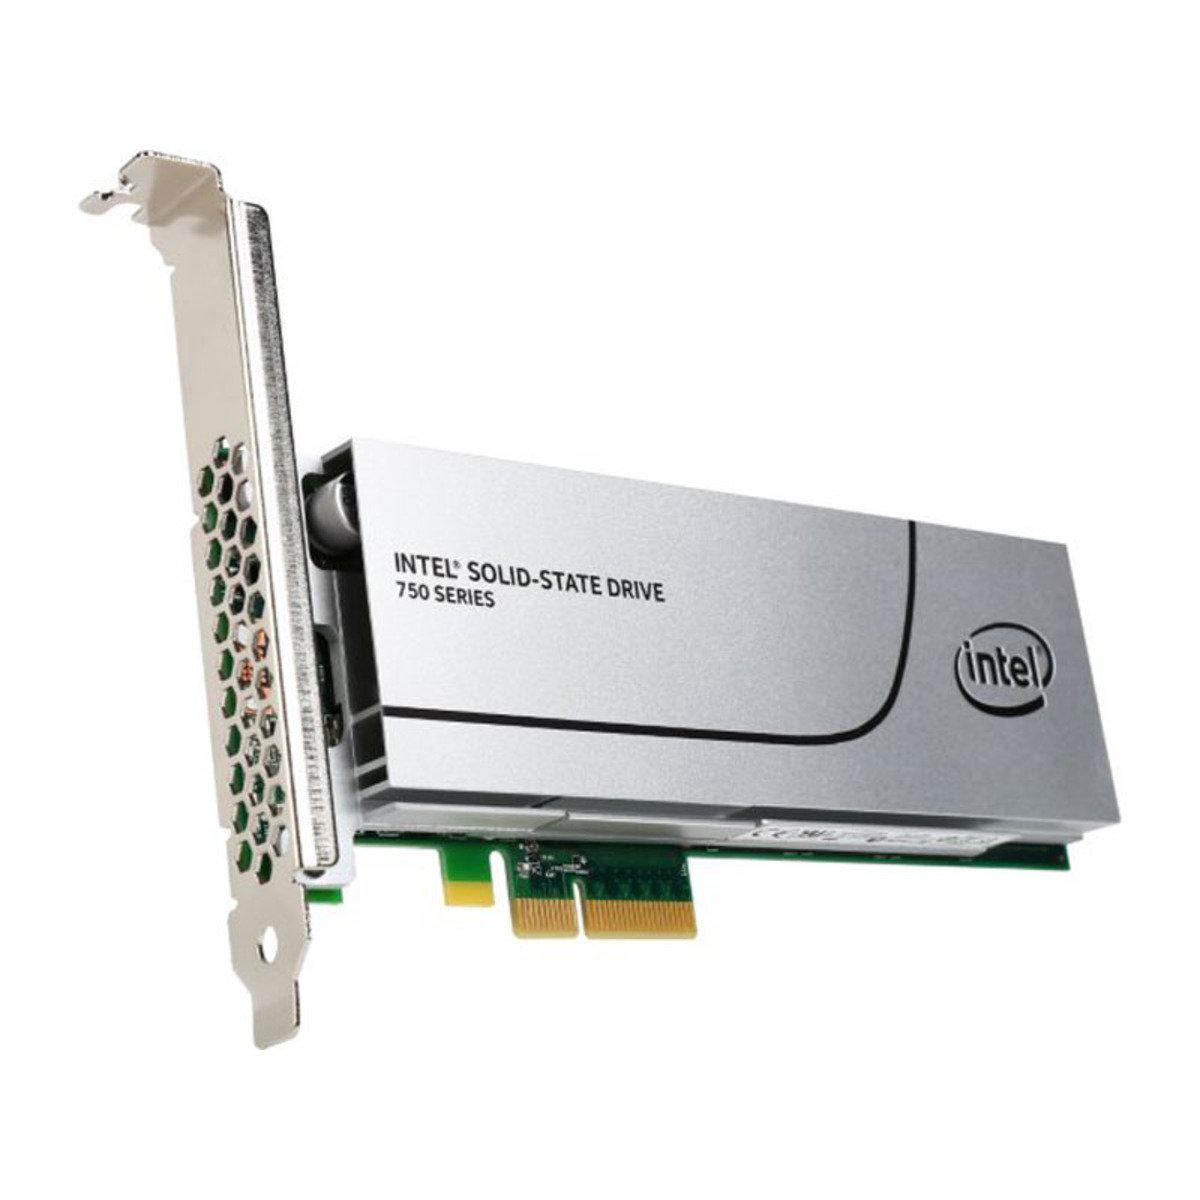 SSD 超高速NVMe內置固態硬碟 750系列AIC 1.2TB